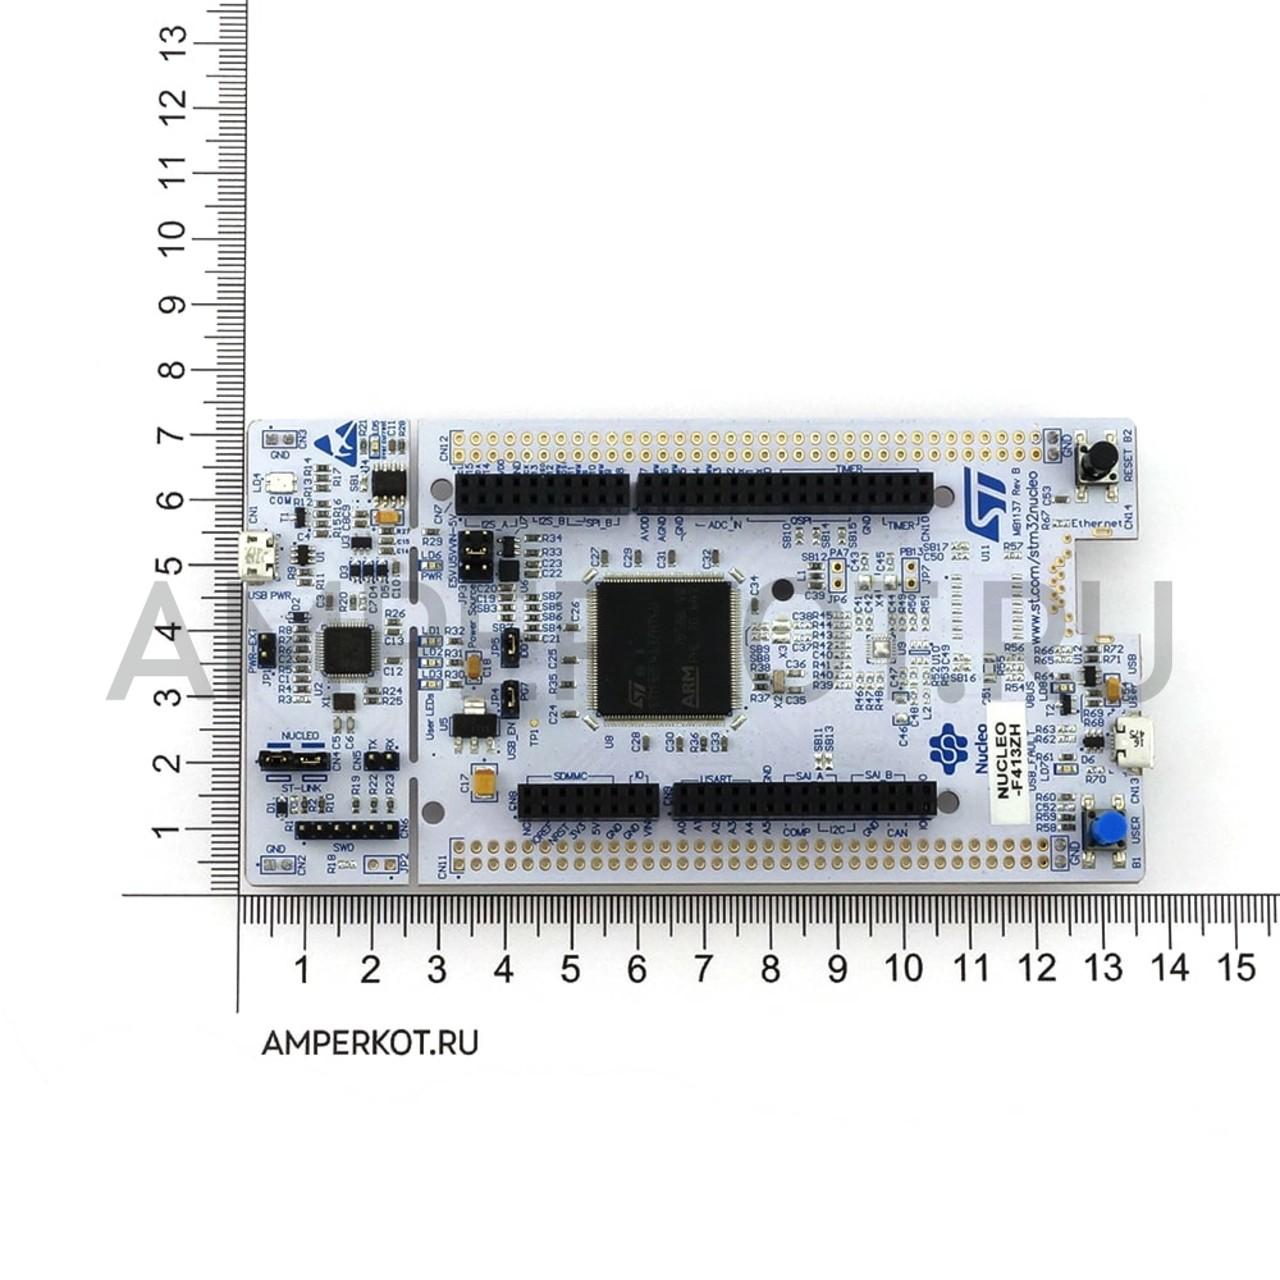 NUCLEO-F413ZH, Отладочная плата, Nucleo-144, STM32, ST-LINK/V2-1, ST  Zio/Morpho